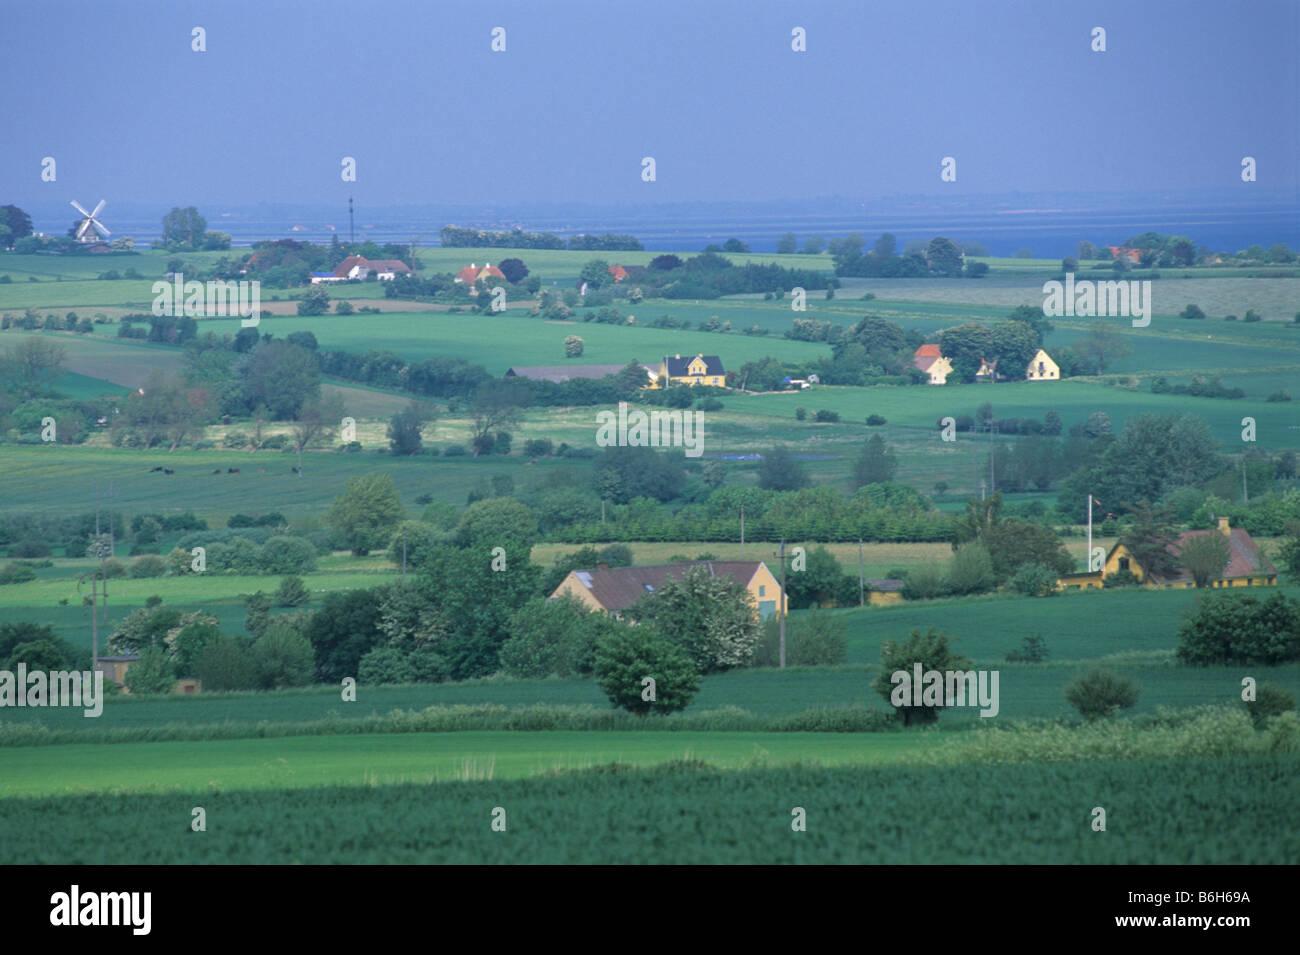 Elk167 3104 Denmark Aero Island farmland agriculture - Stock Image